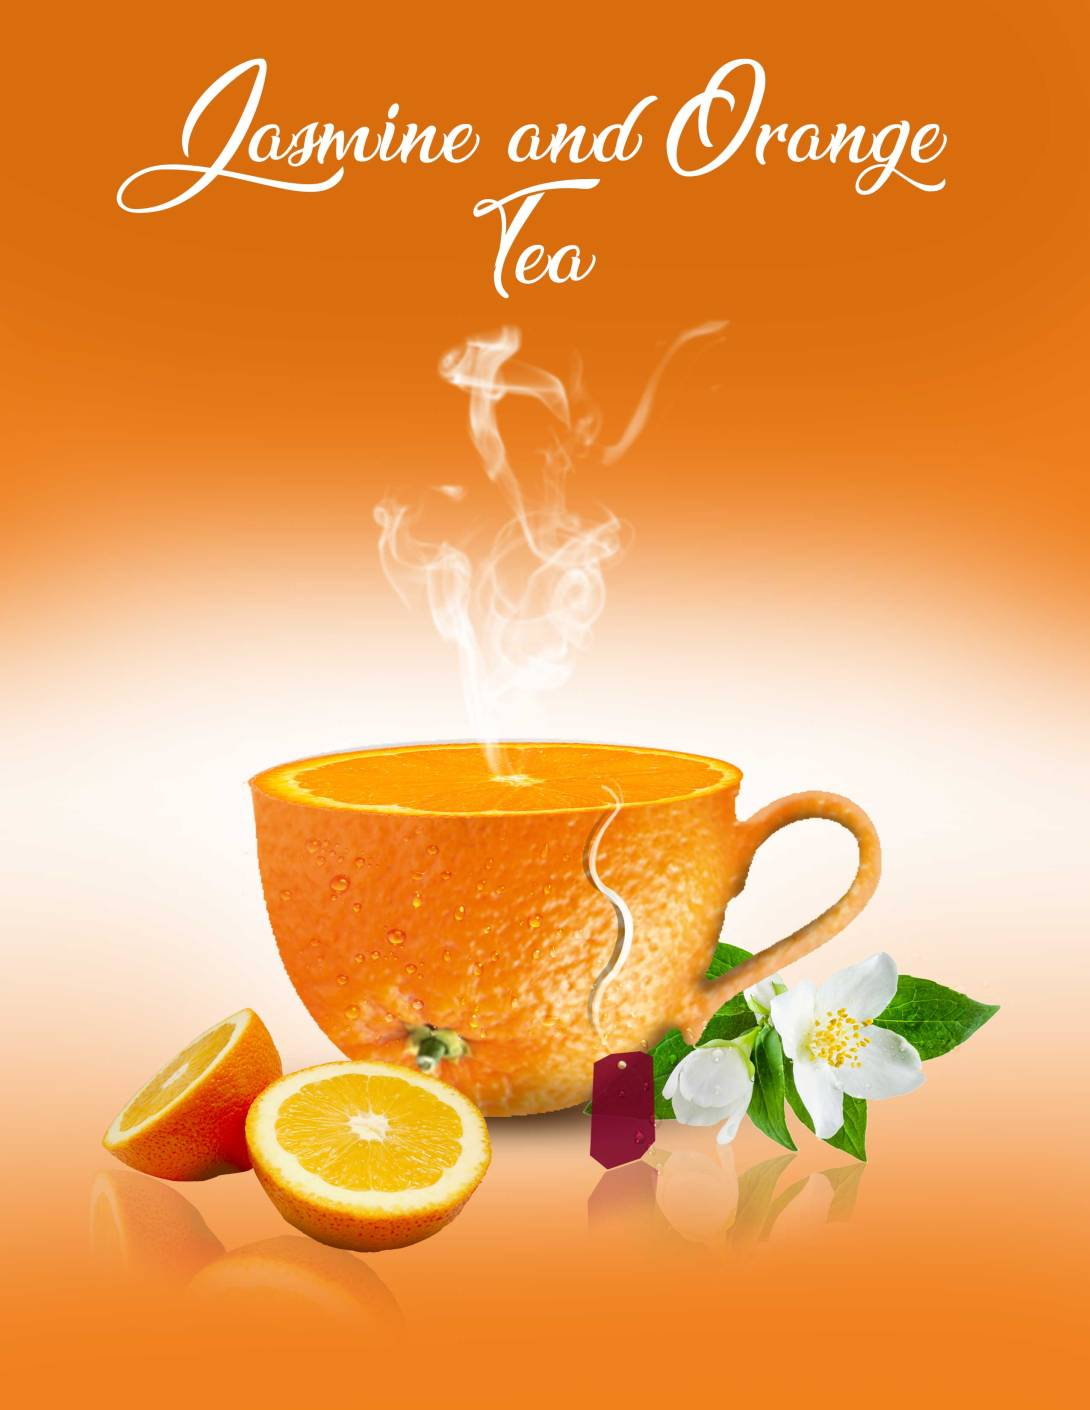 jasmine-and-orange-tea